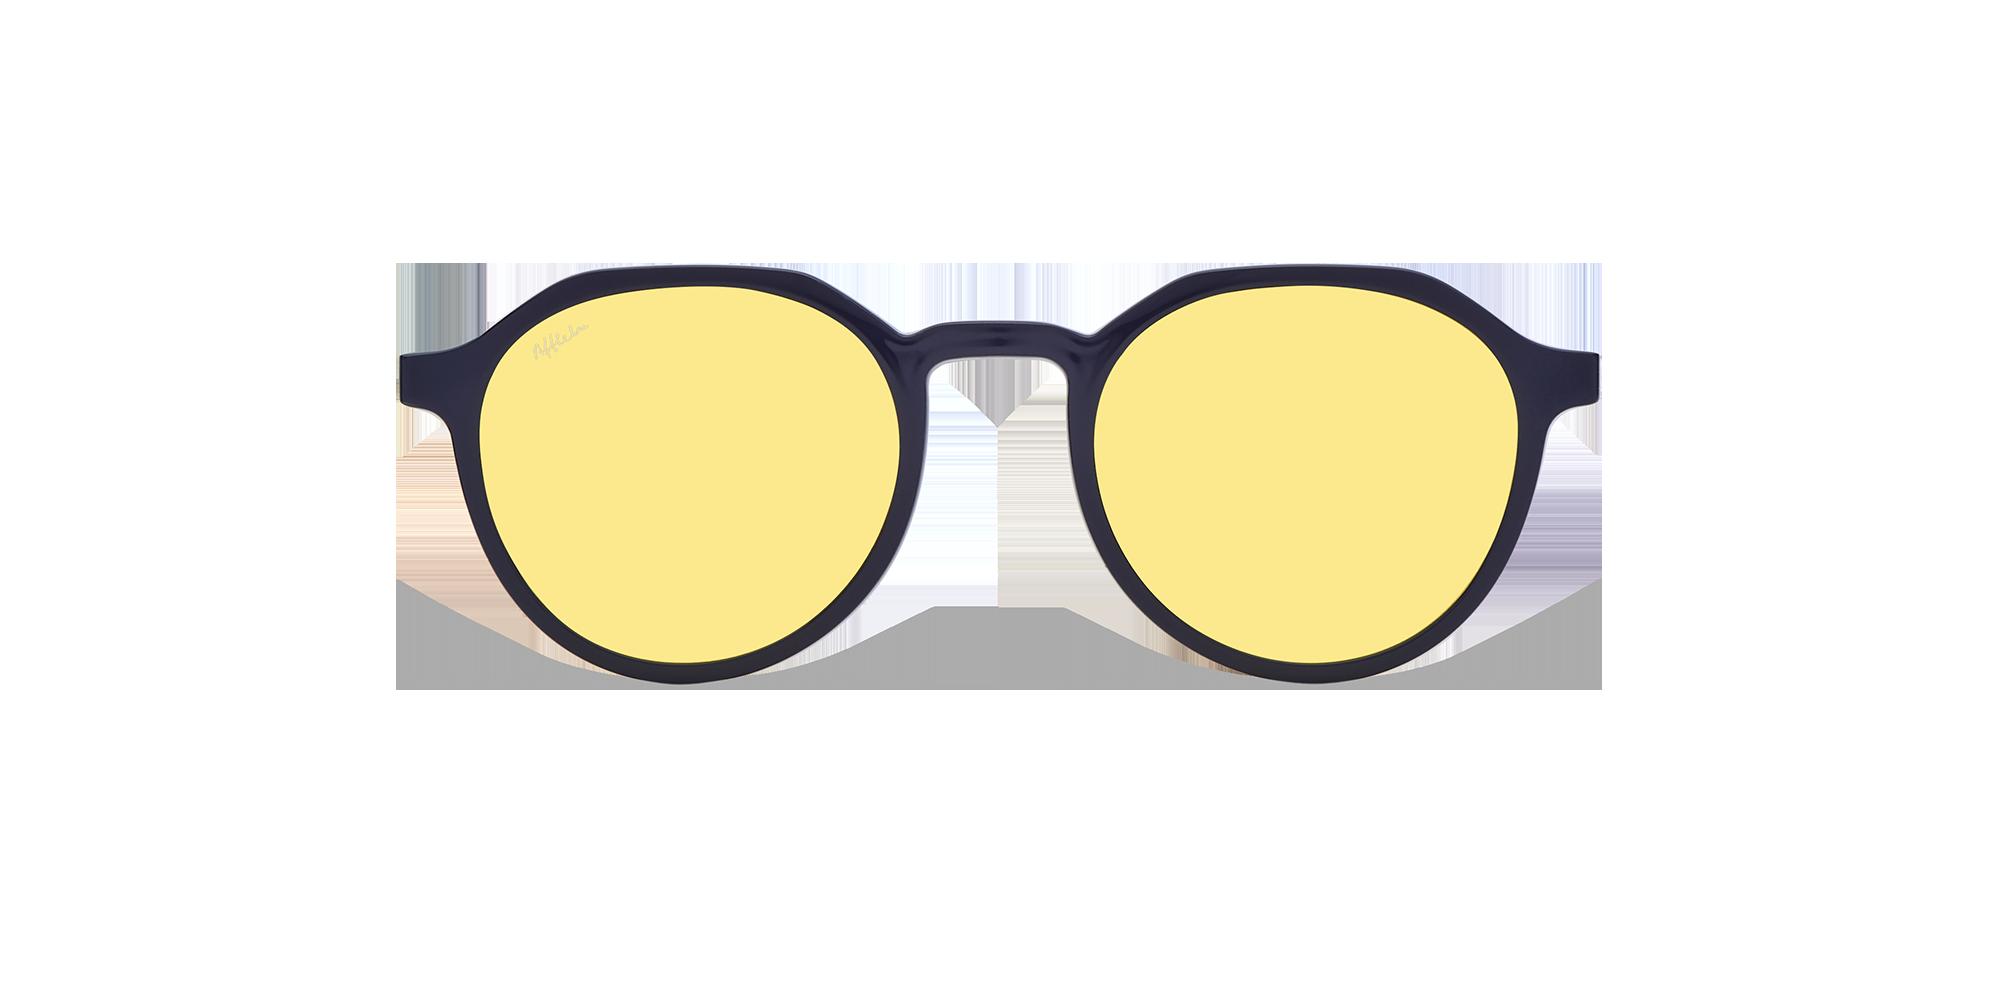 afflelou/france/products/smart_clip/clips_glasses/07630036429037_face.png